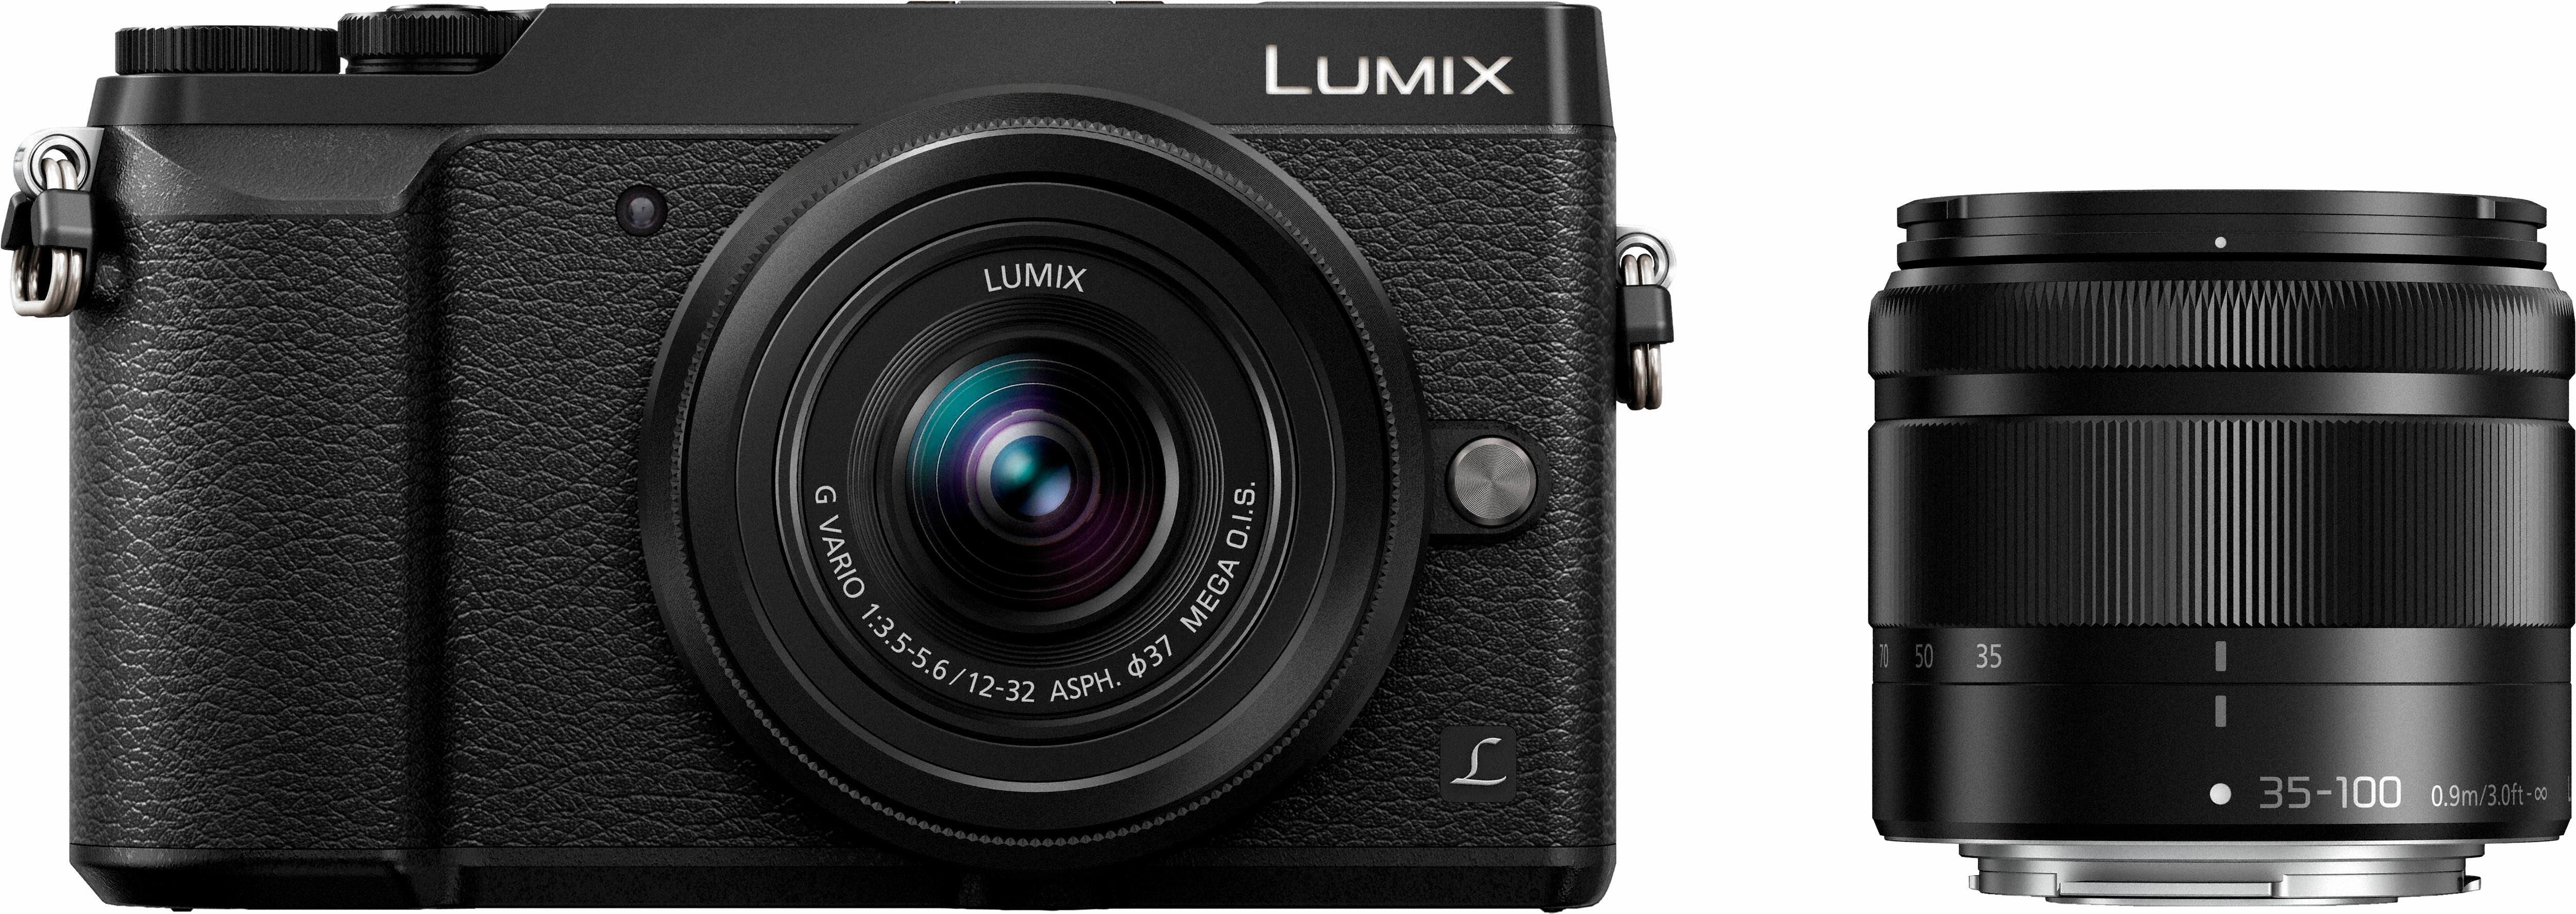 Lumix Panasonic DMC-GX80WEG-K System Kamera